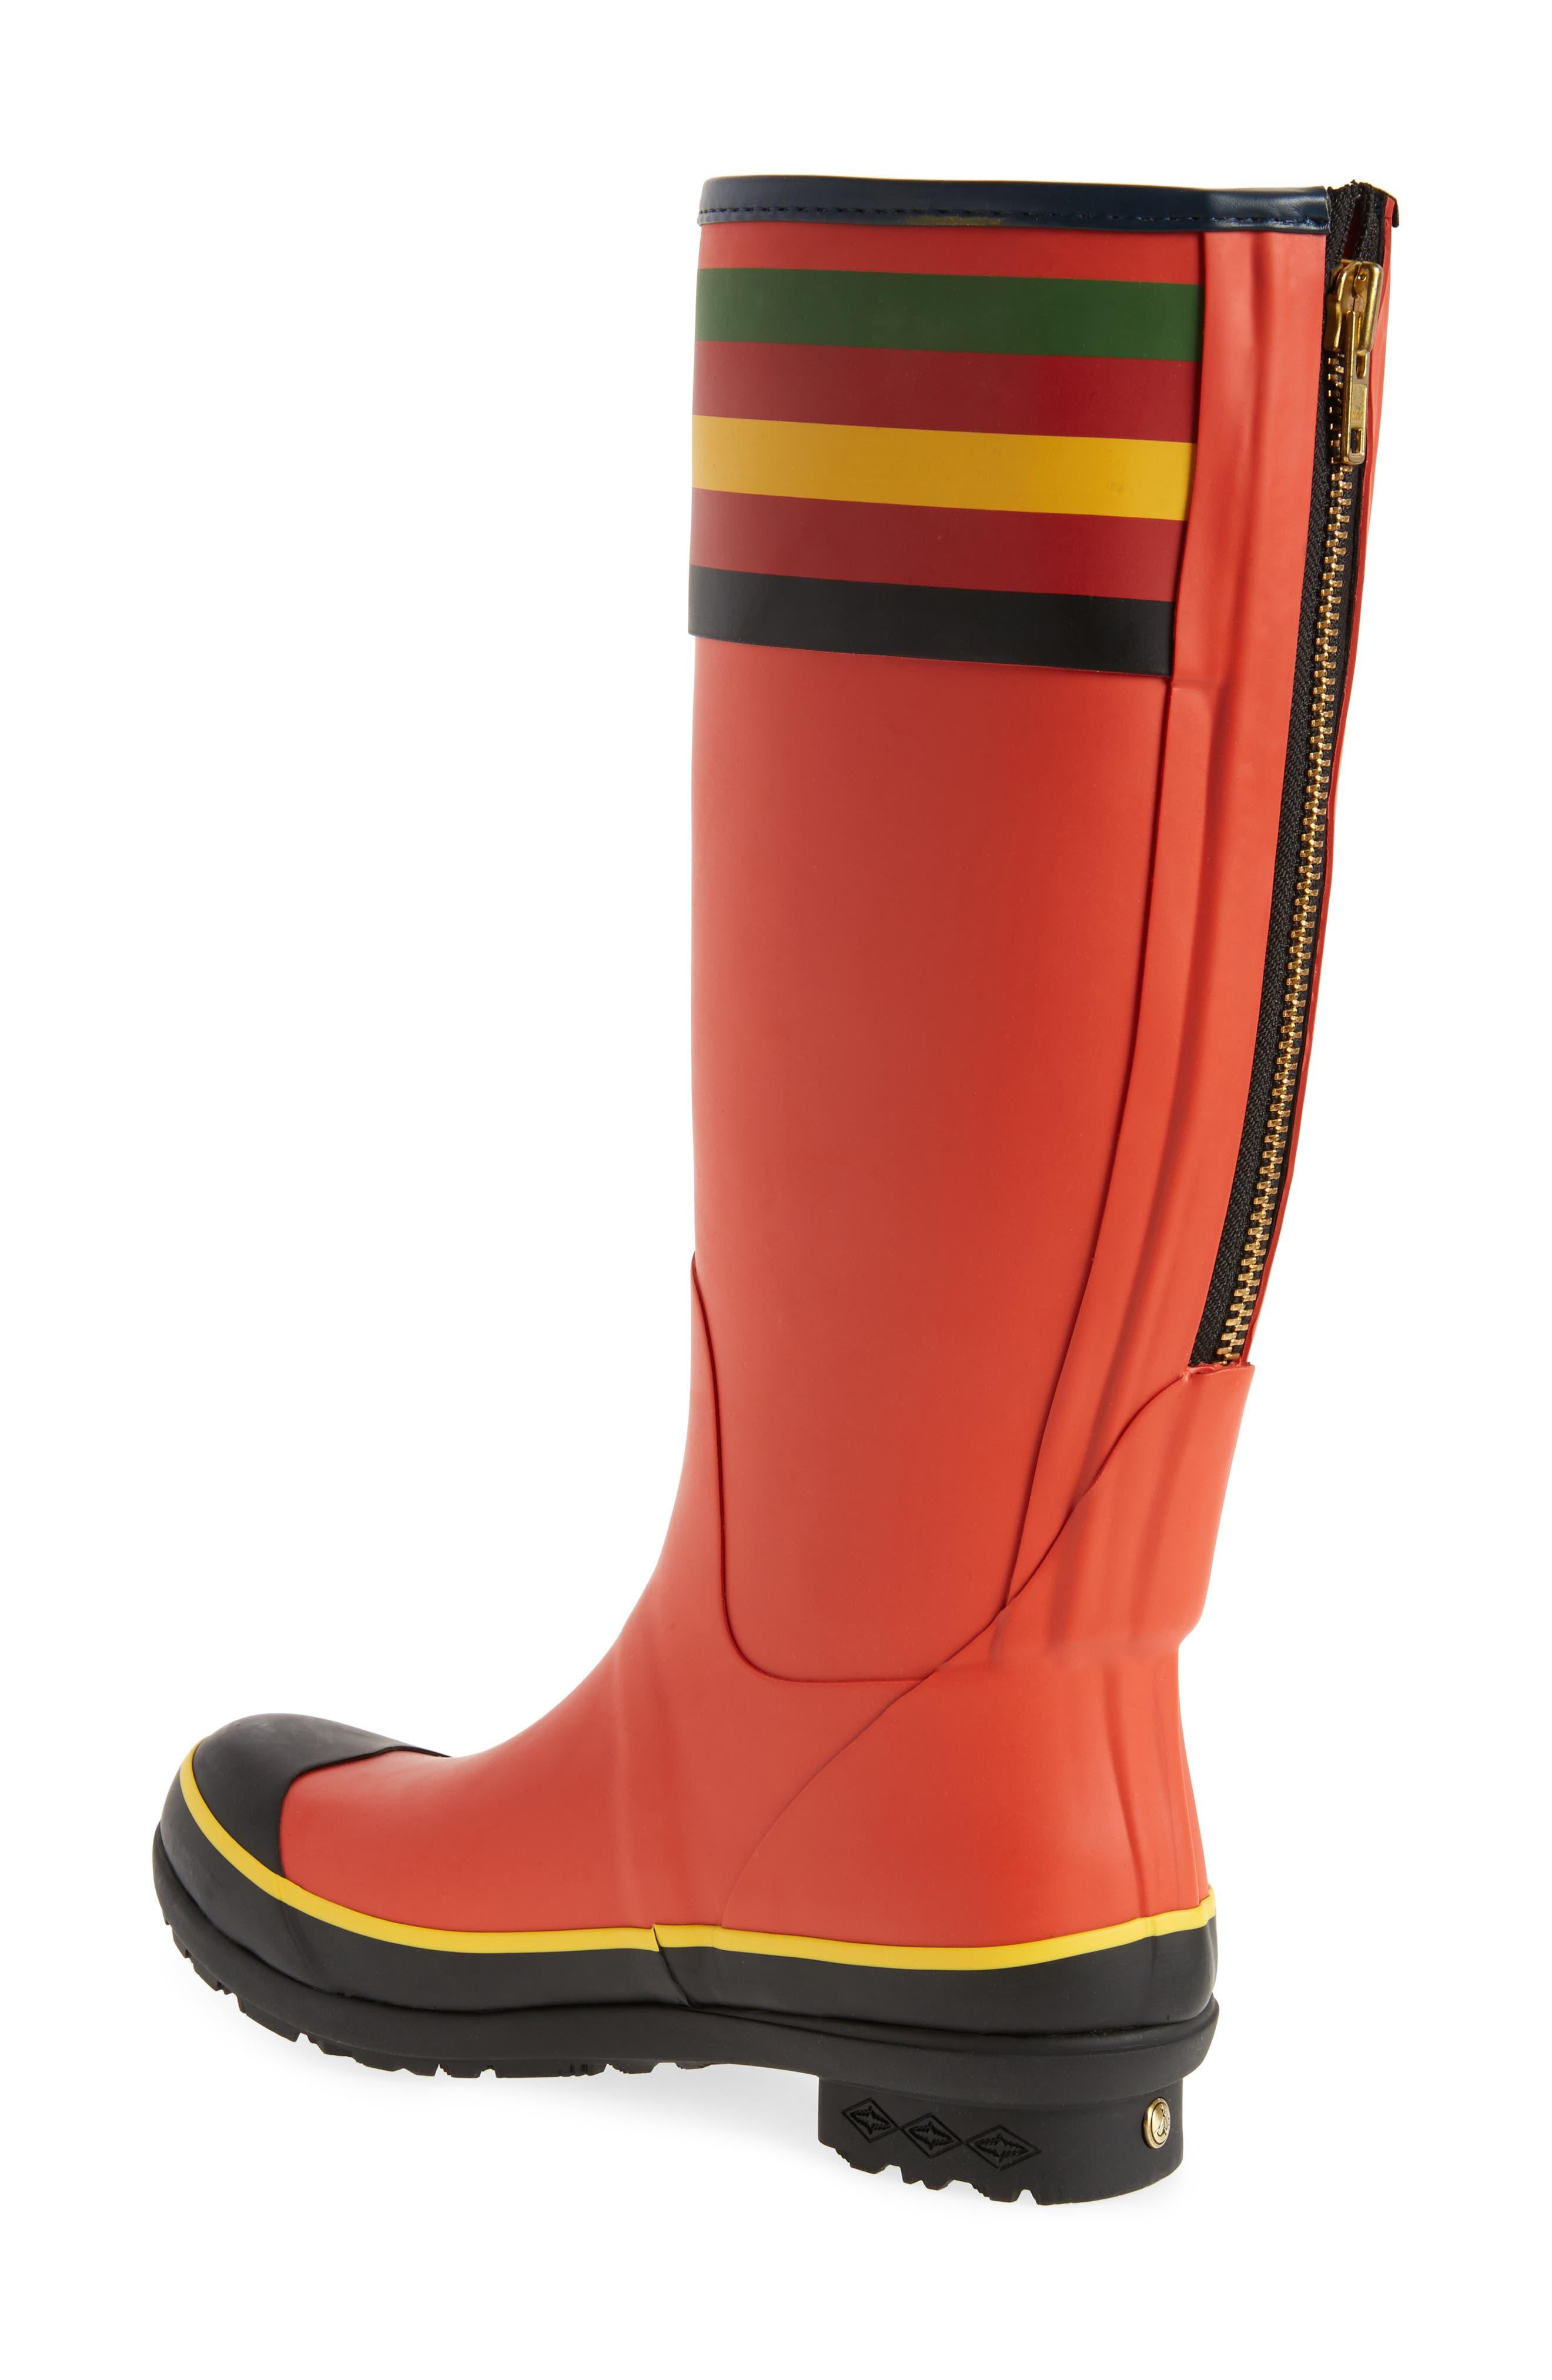 Pendleton Rainier National Park Tall Rain Boot,                             Alternate thumbnail 2, color,                             Red